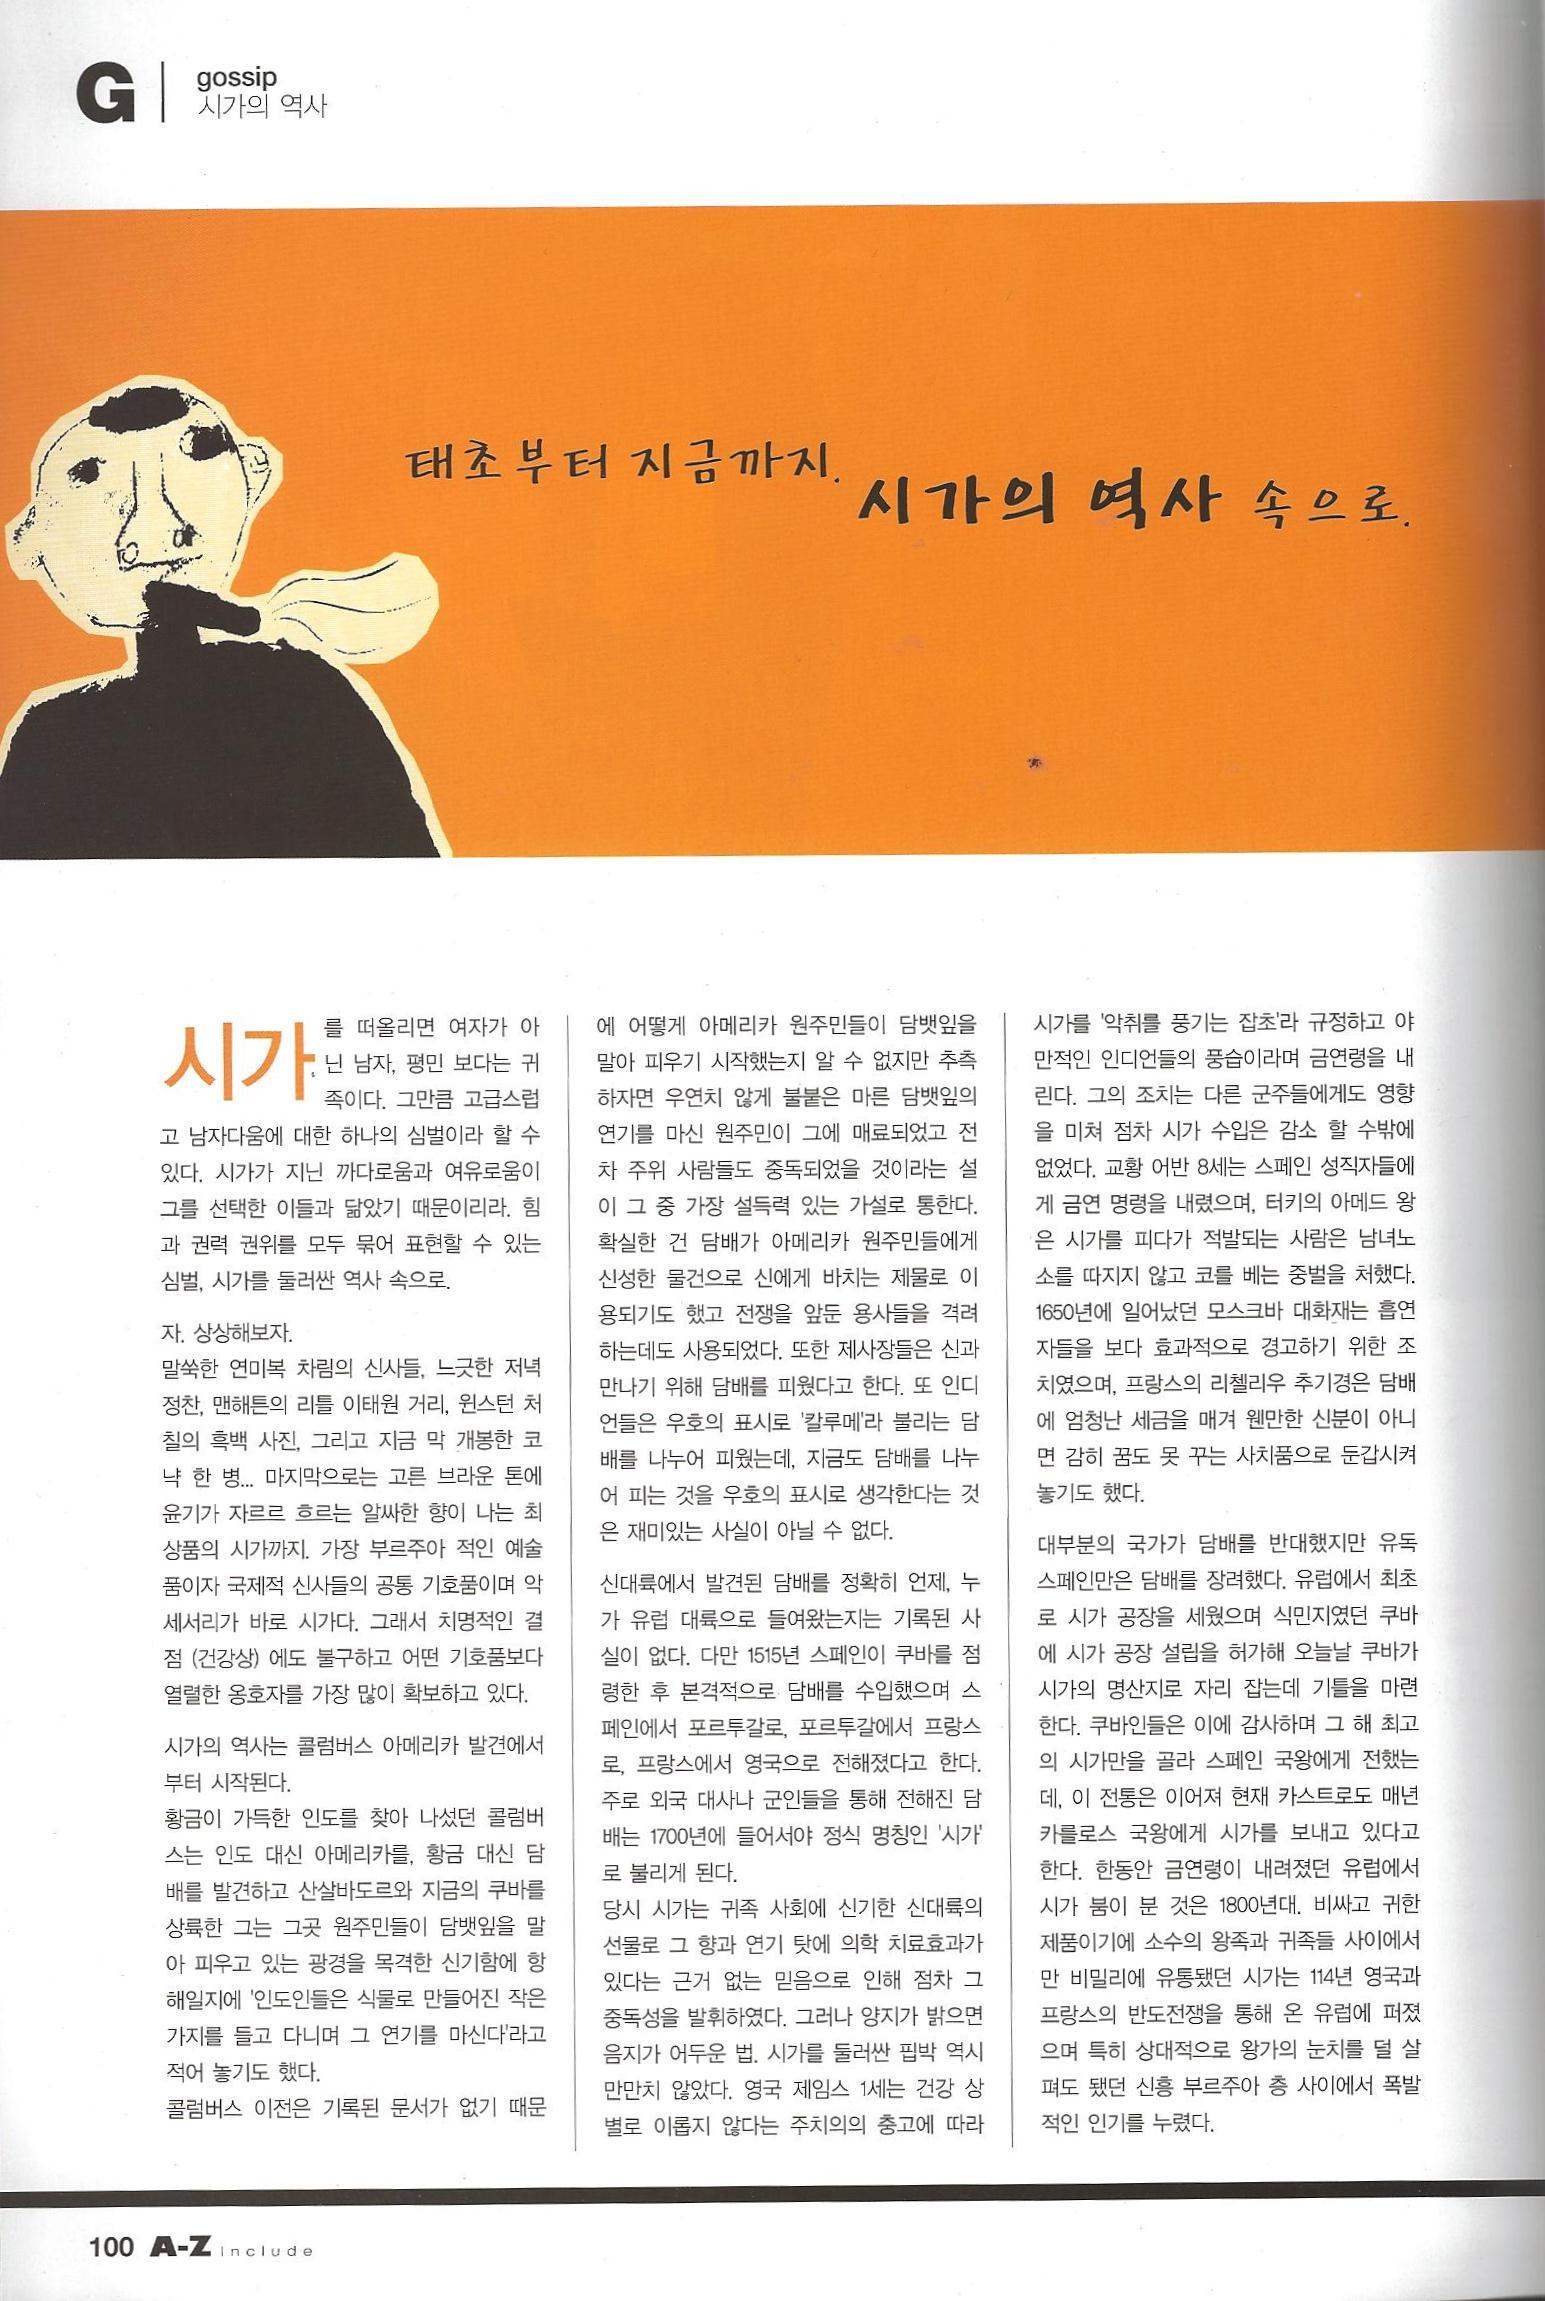 2012-10 A-Z article 1.jpg